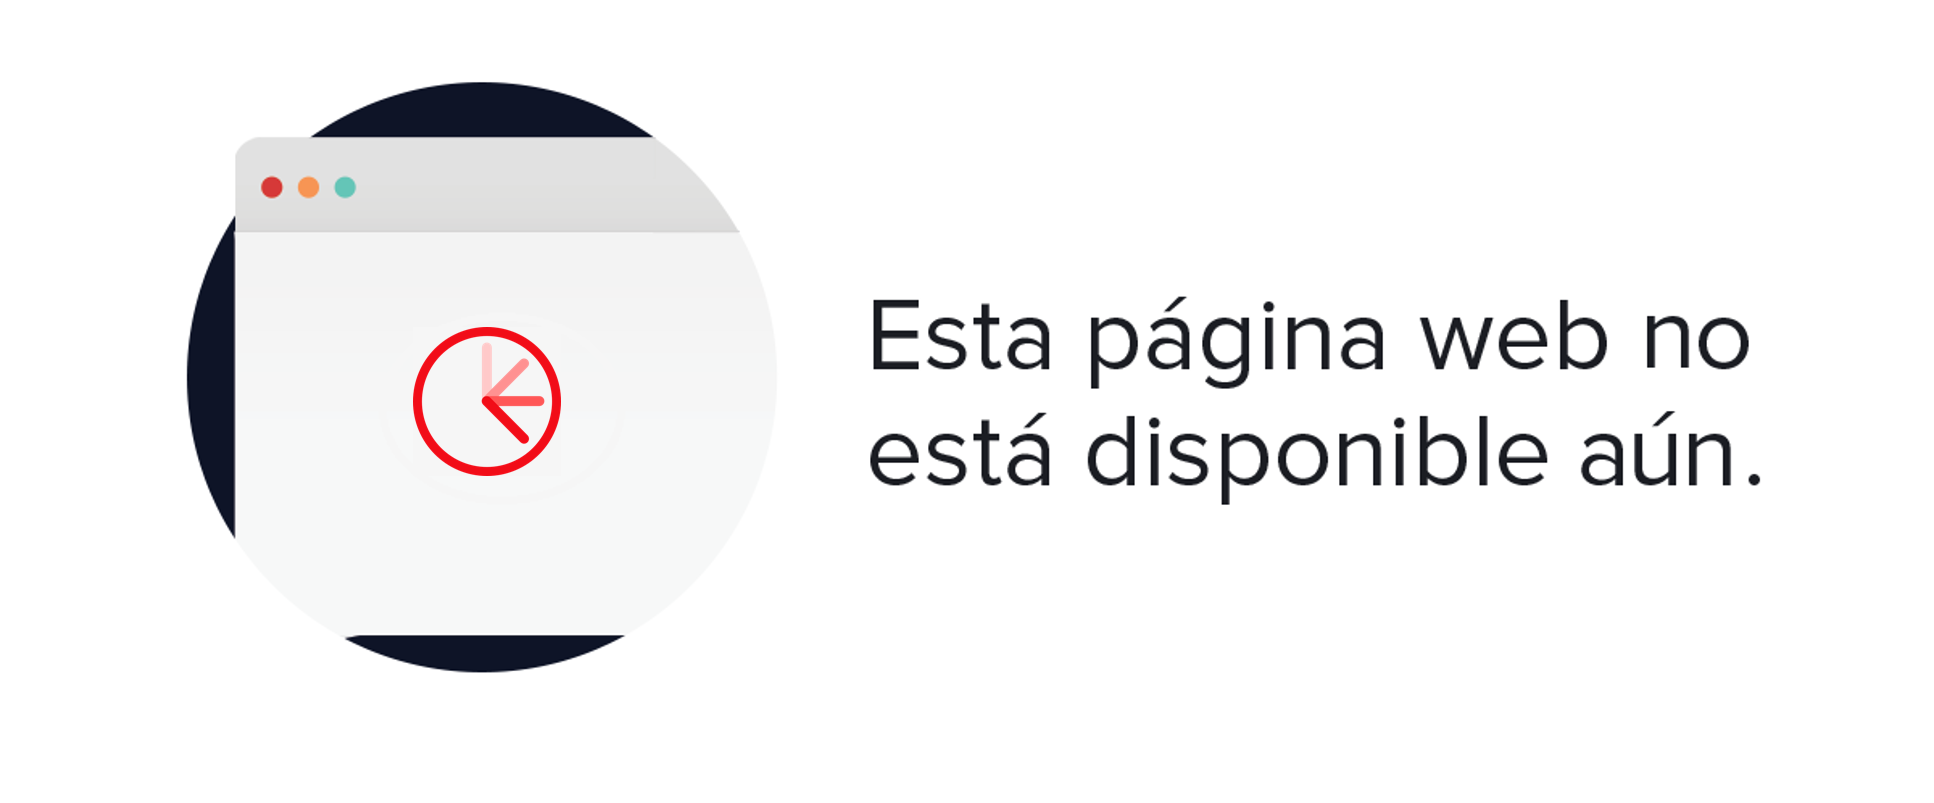 Mirto - Chaqueta de terciopelo de mujer Mirto con maxi solapa Verde 001015720418258038 - MPVXKYS